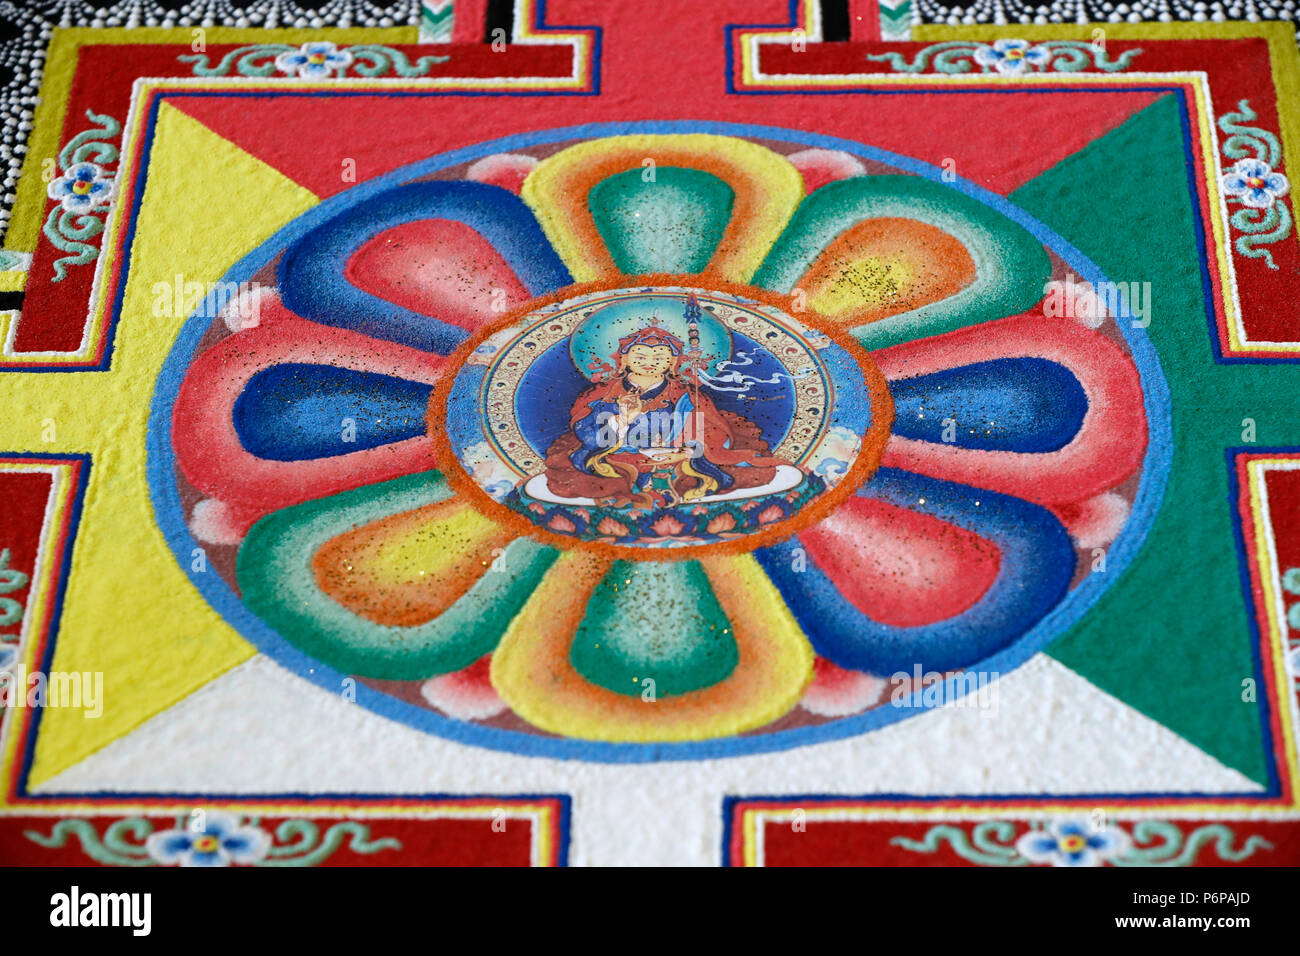 Tibetan Buddhist sand mandala. Padmasambhava also known as Guru Rinpoche. - Stock Image